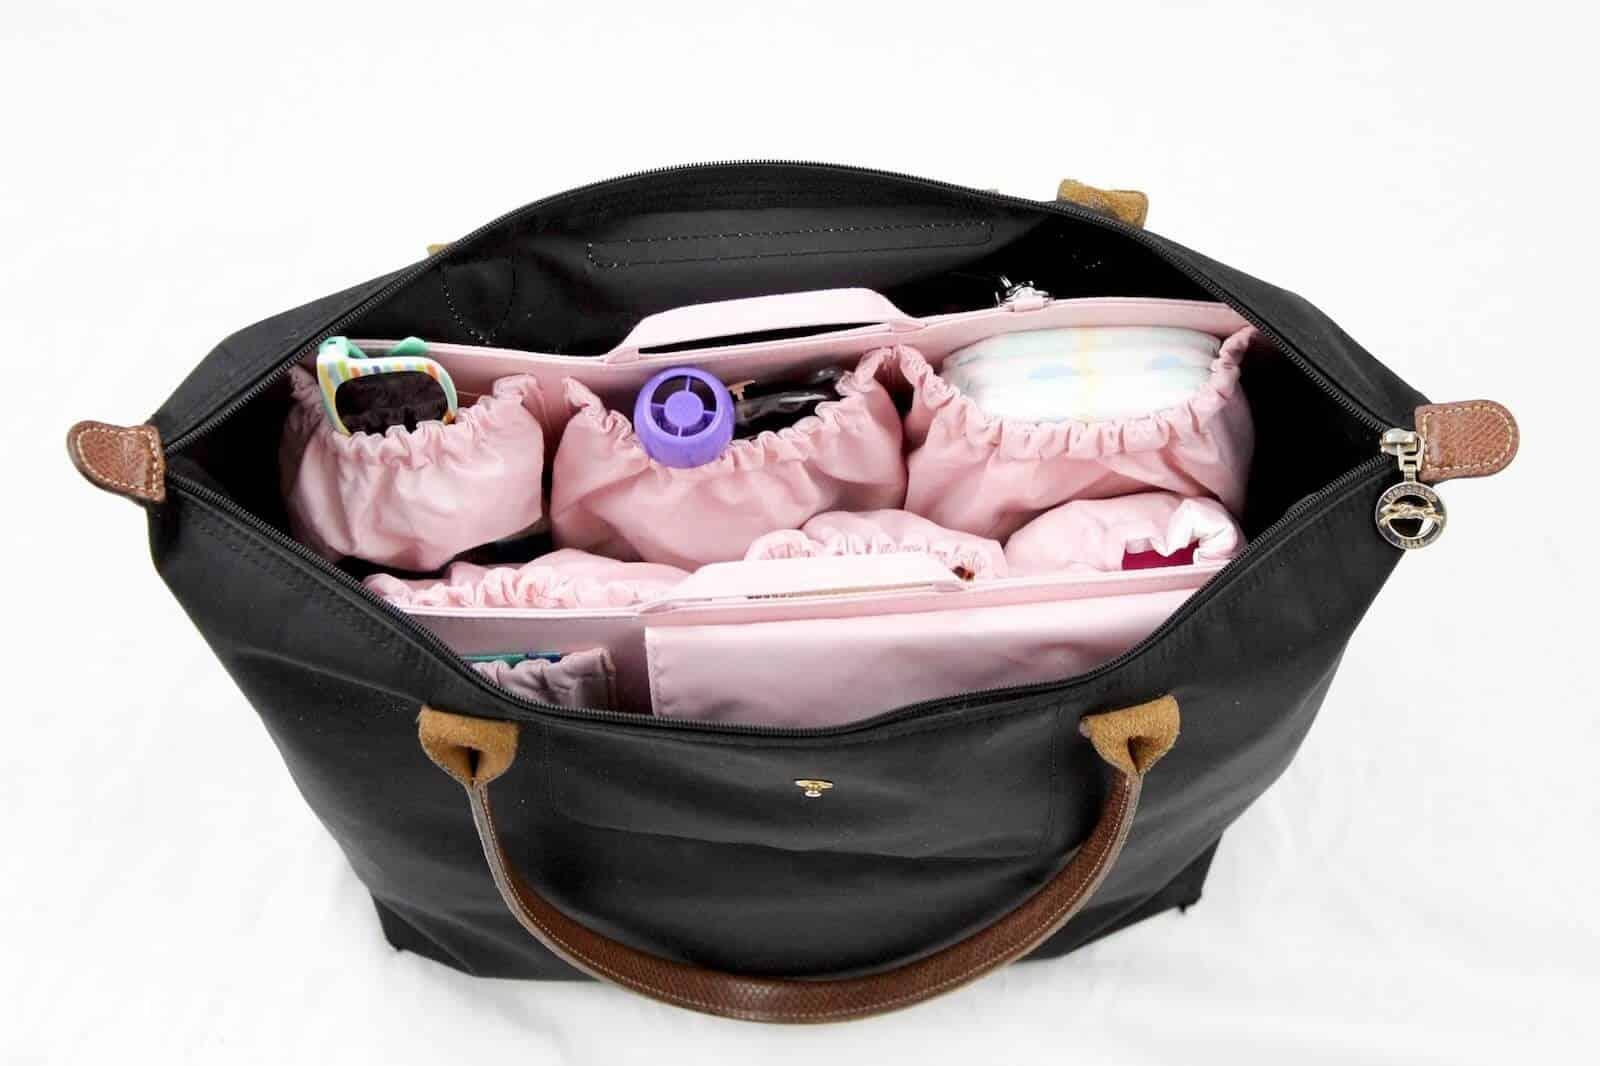 Diaper bag organization for toddler items.